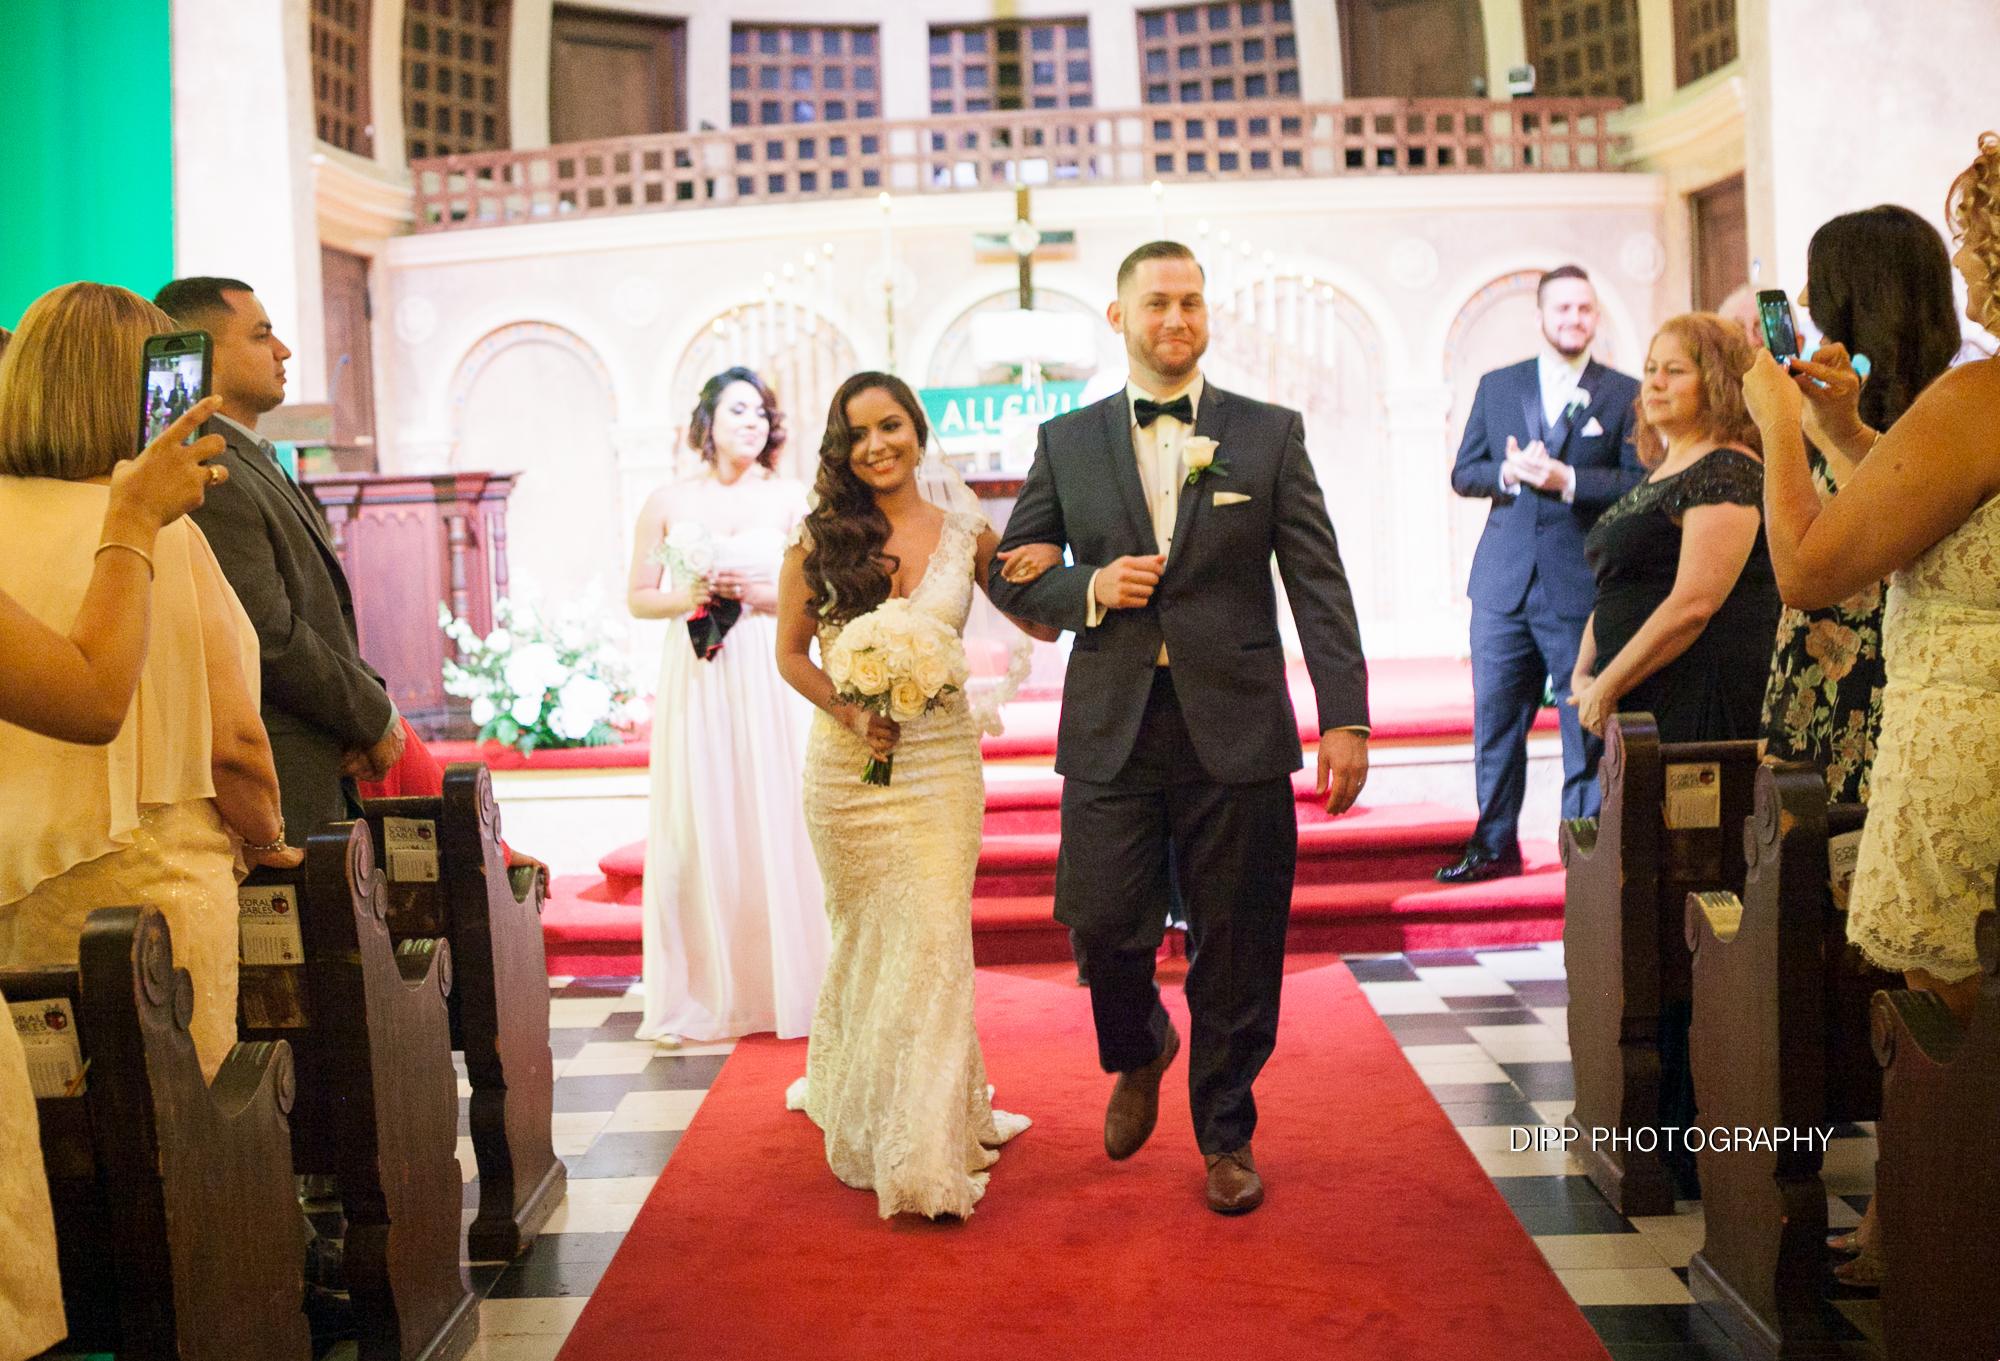 Dipp_2016 EDITED Melissa & Avilio Wedding-243